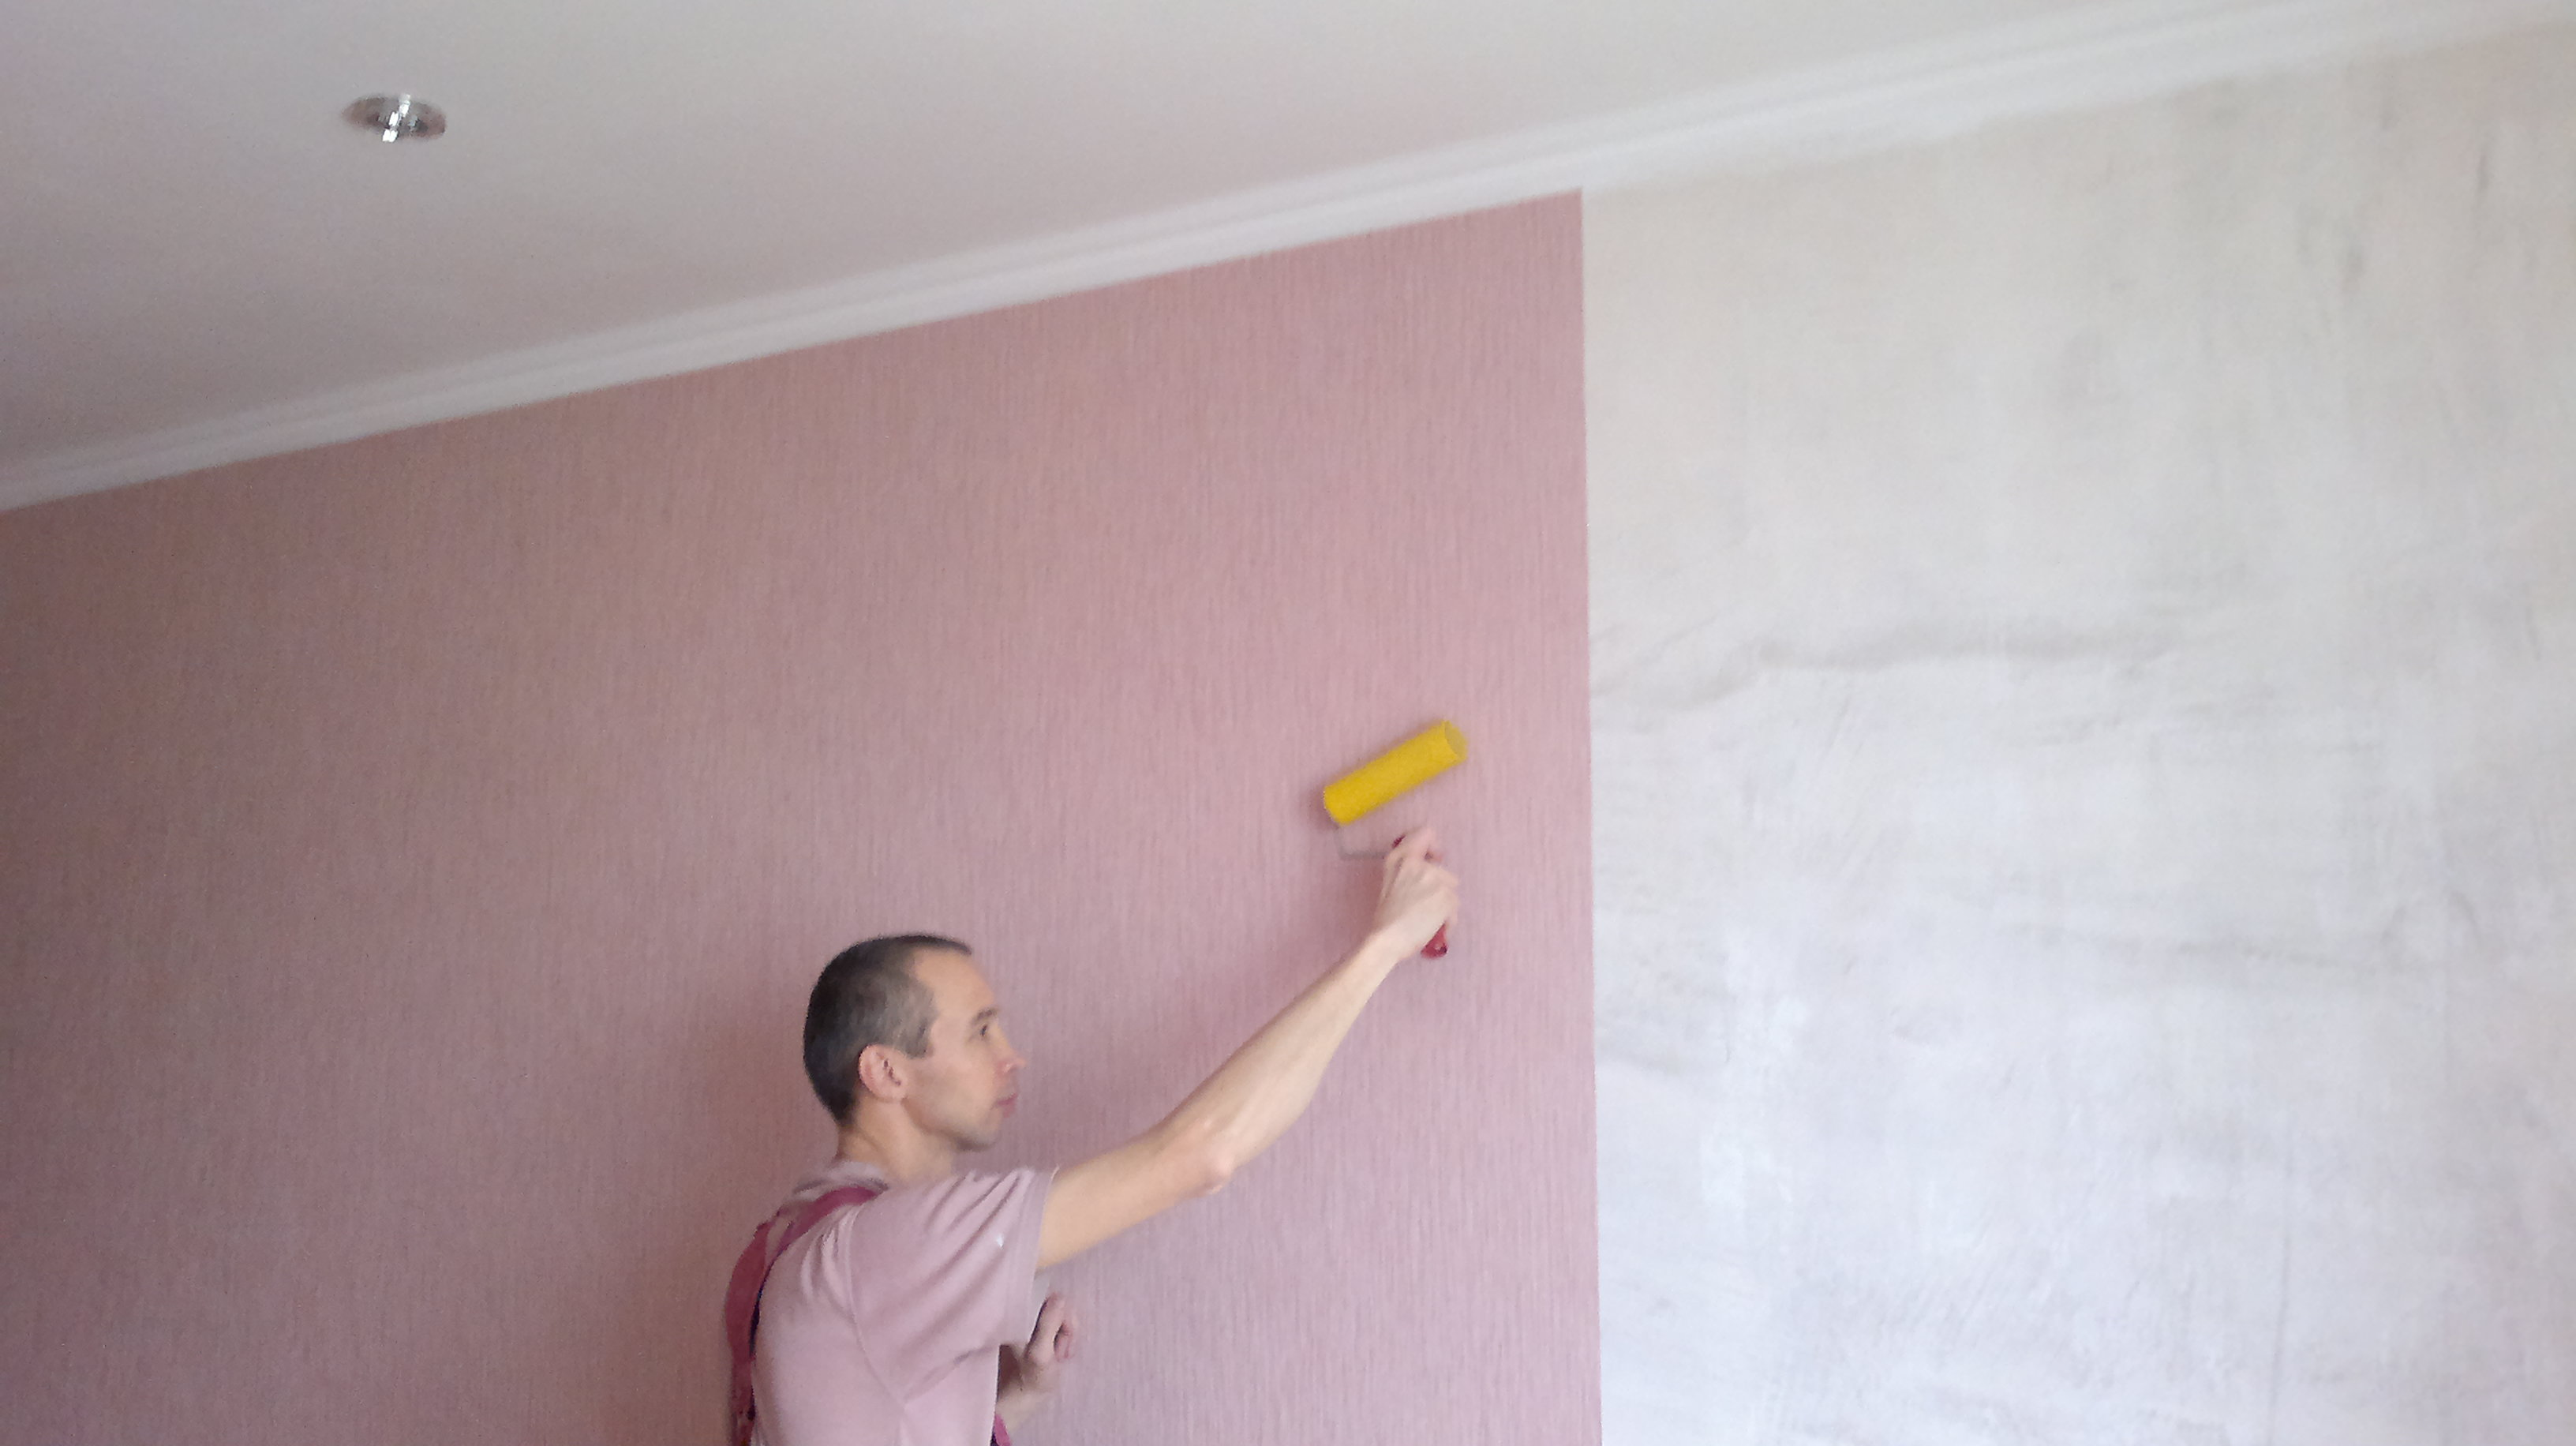 Окрашивание стен или обои